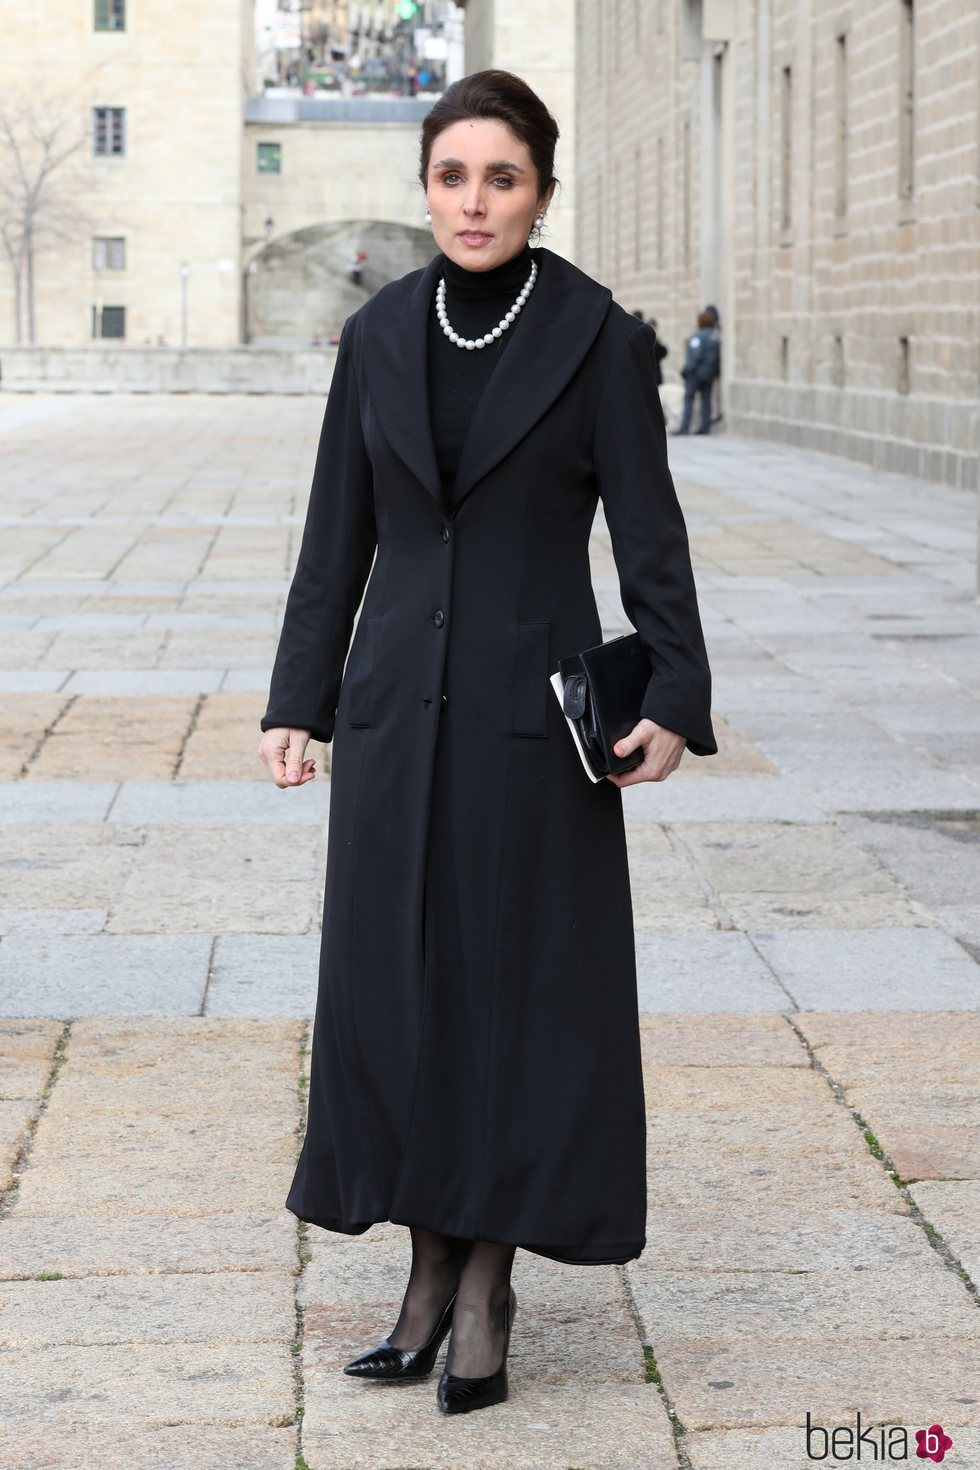 Paloma Segrelles en el funeral de la Infanta Pilar en El Escorial